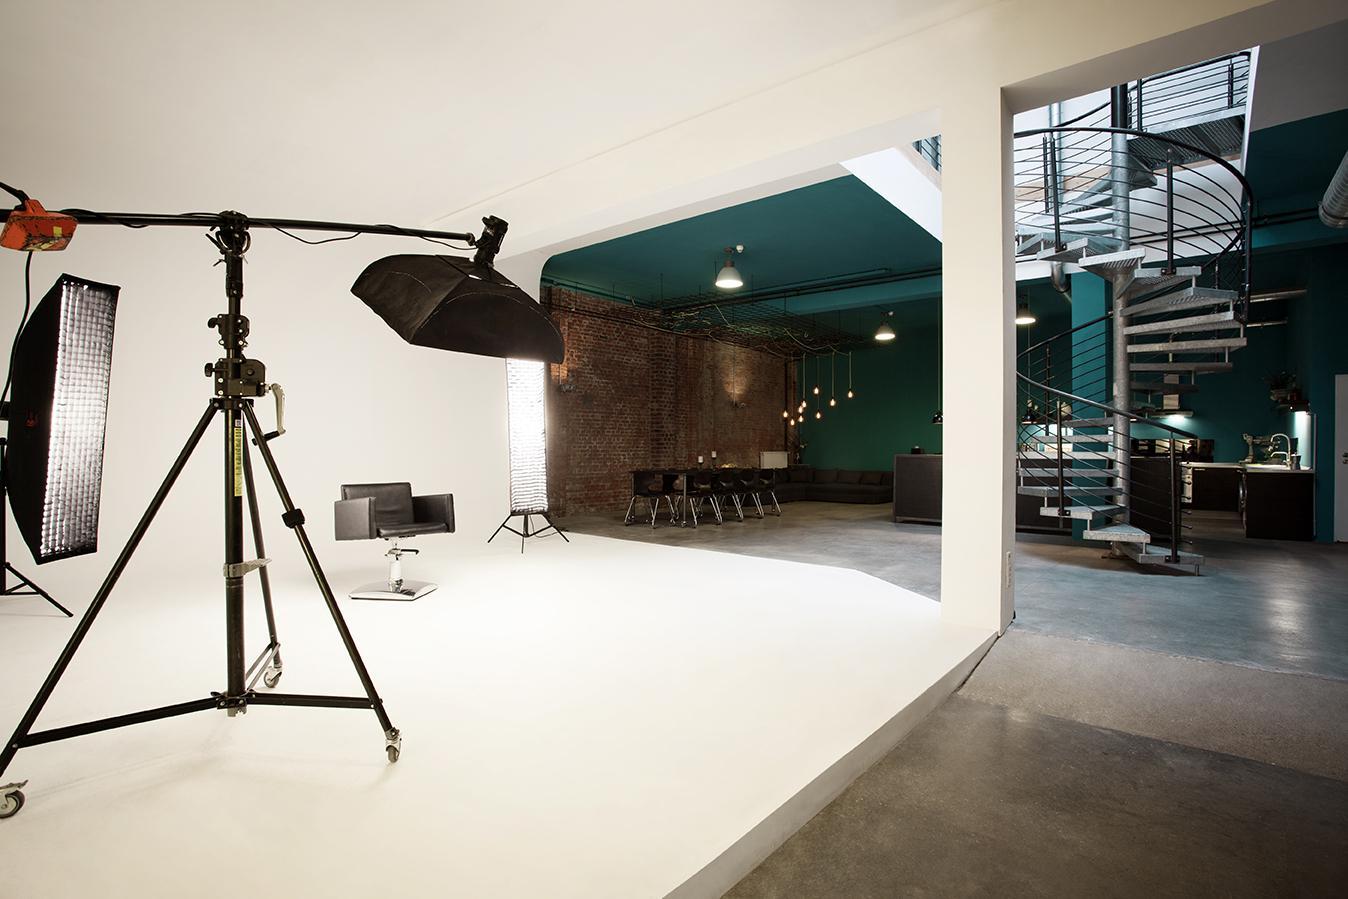 studios locations. Black Bedroom Furniture Sets. Home Design Ideas